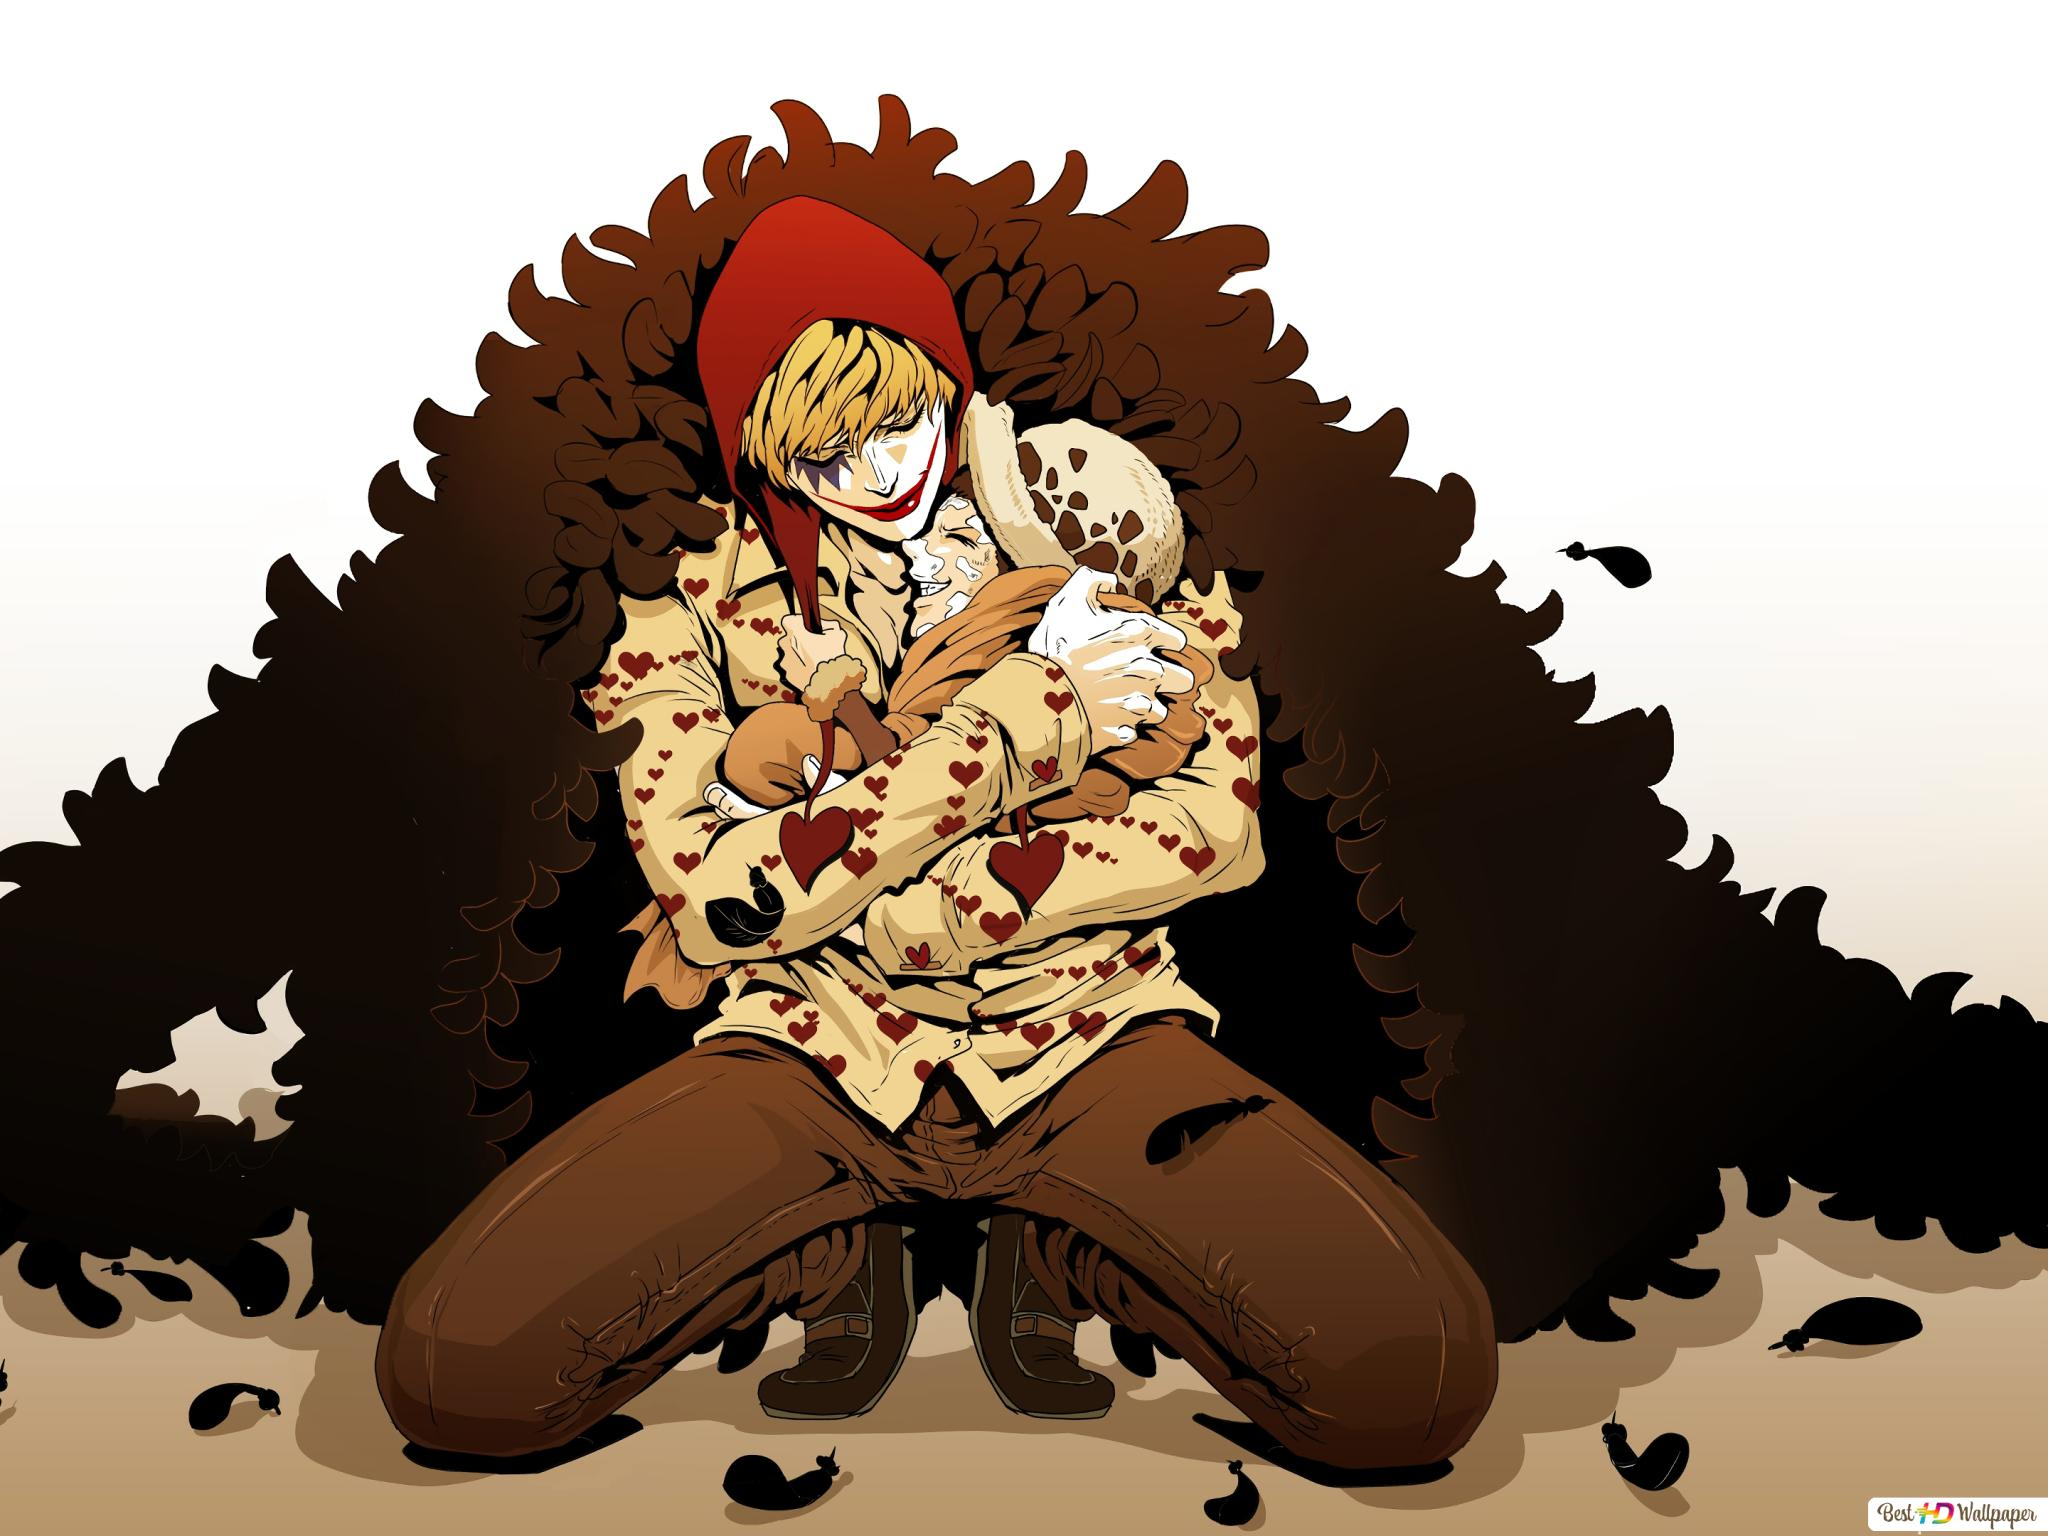 One Piece - Corazon Doflamingo,Trafalgar Law HD wallpaper